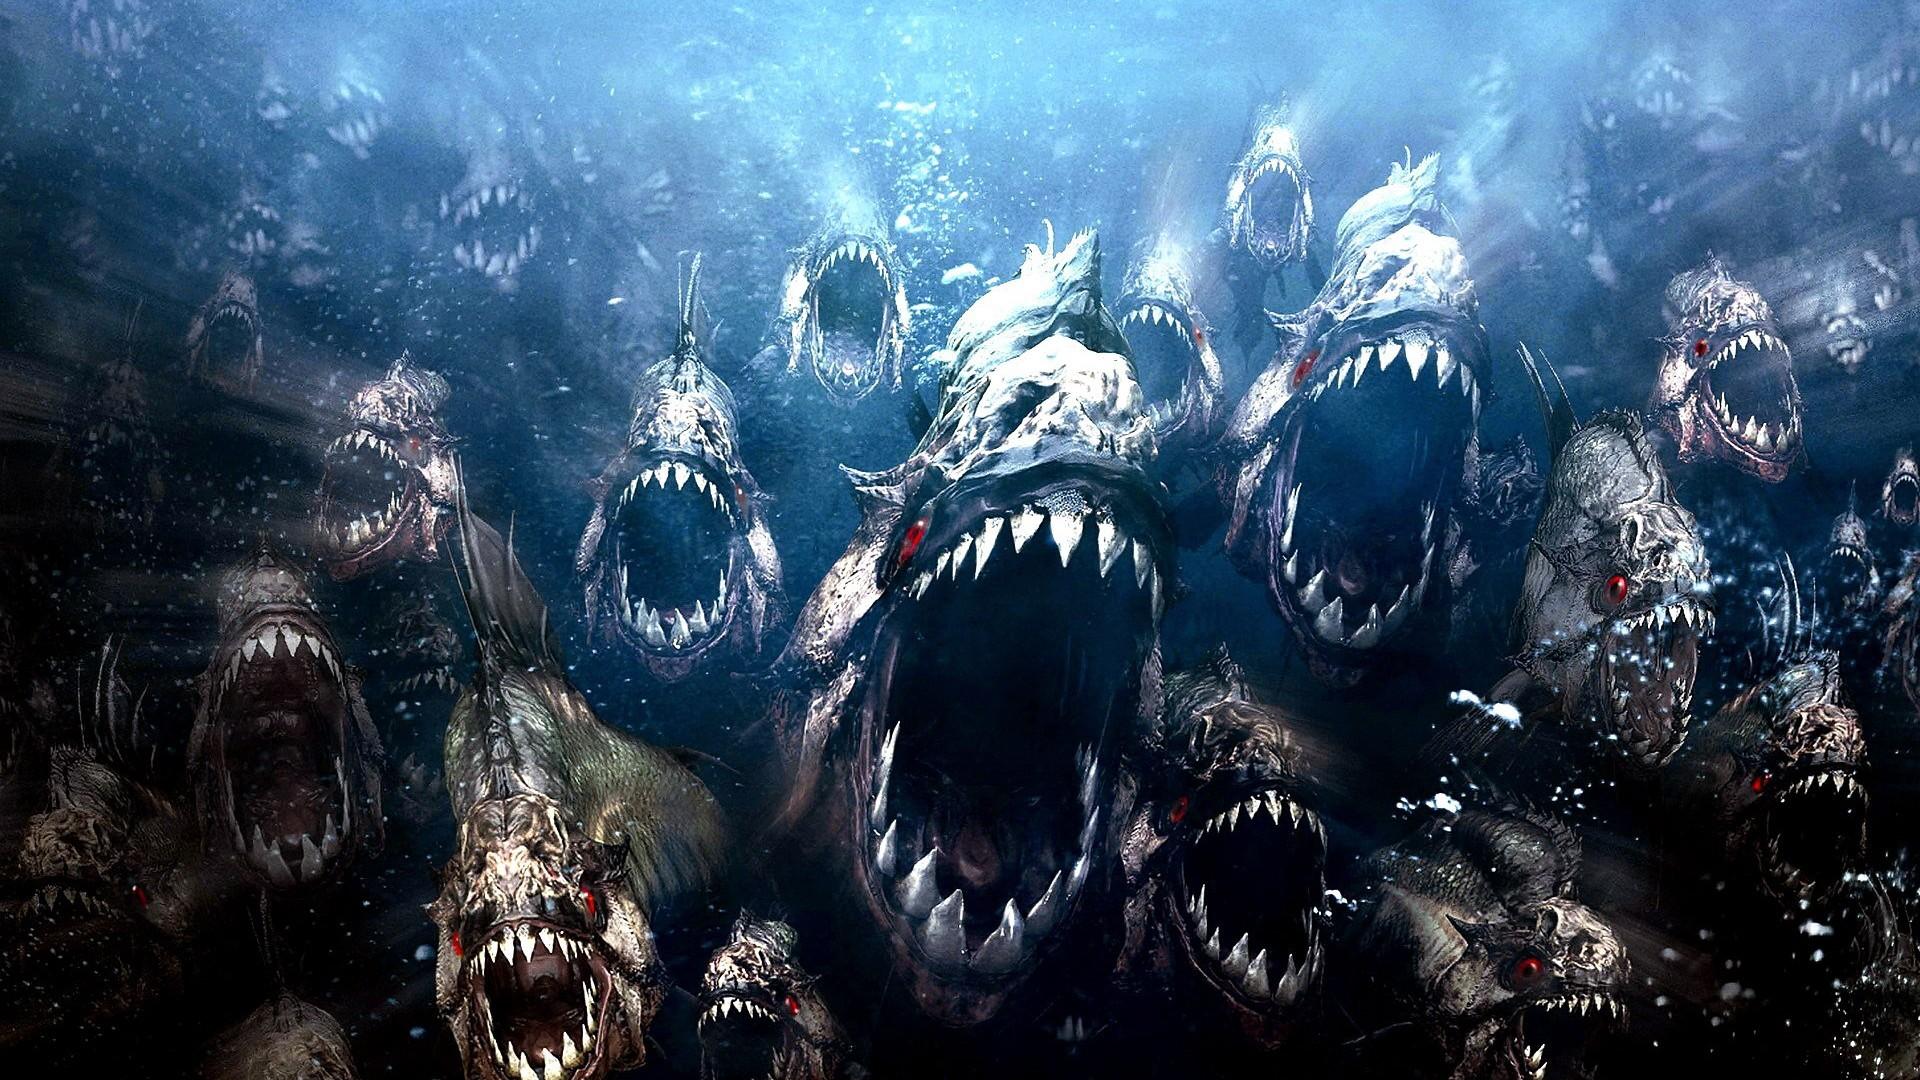 Underwater enemy Wallpaper[1920×1080] · English NewsHorror MoviesBeautiful  WallpaperIphone …